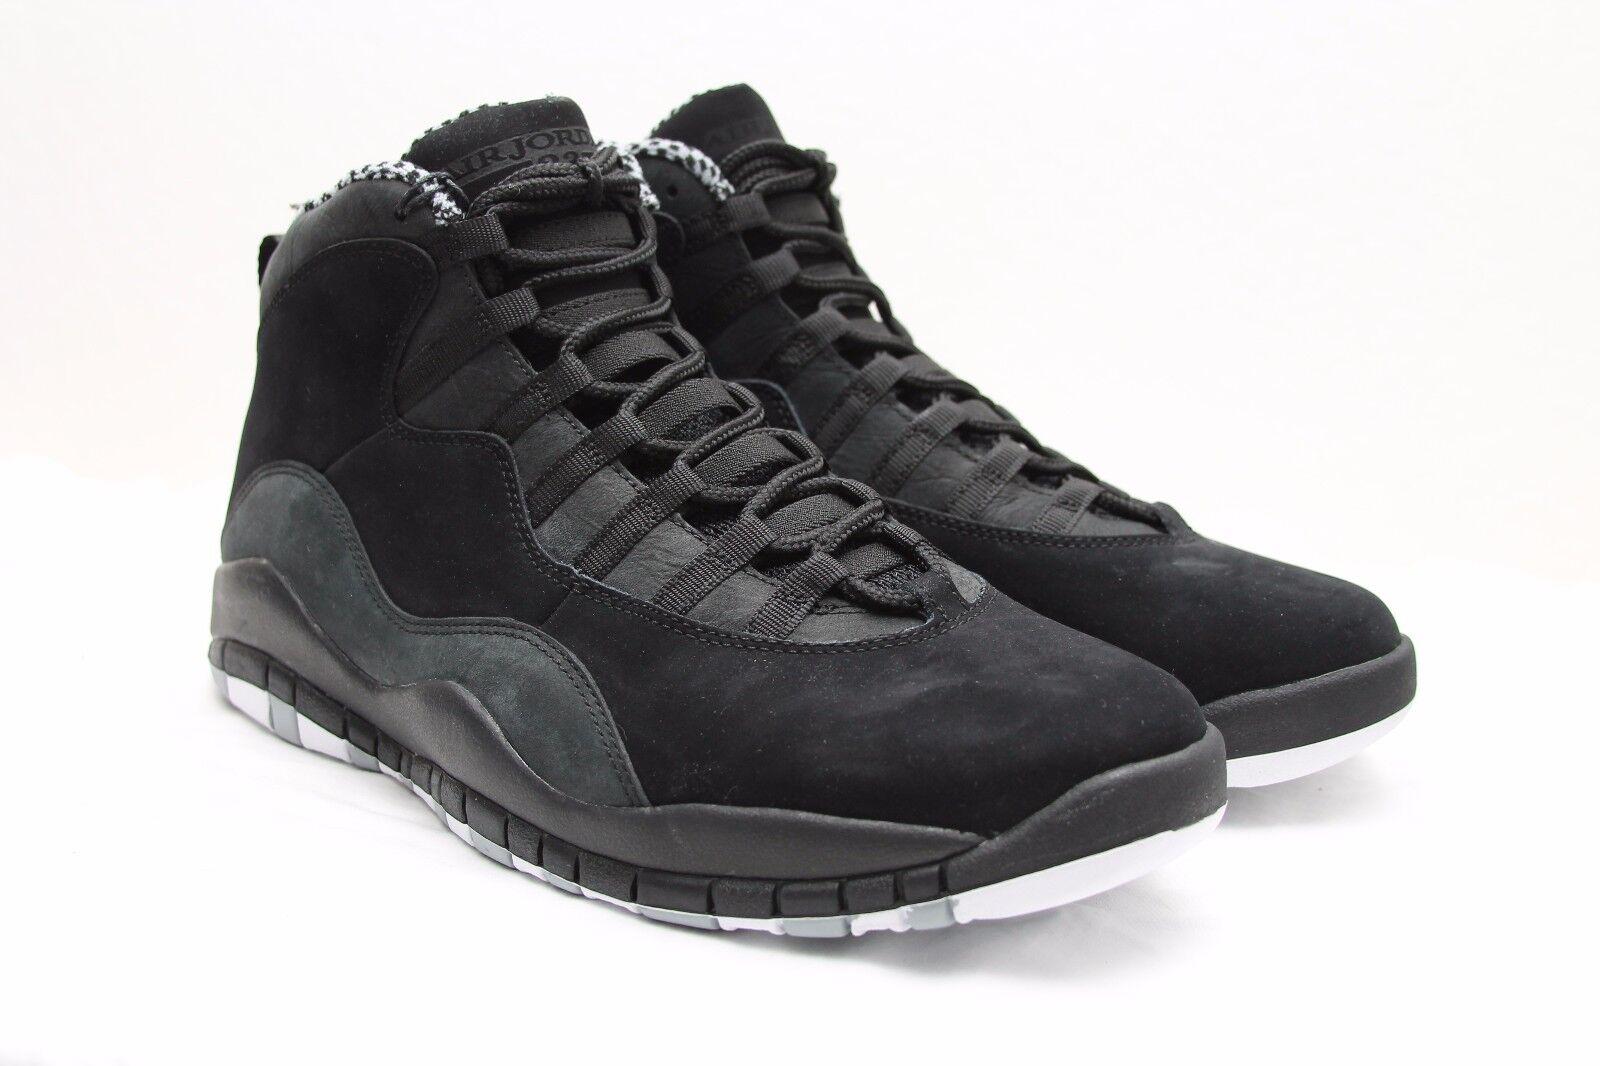 DS 2012 Air Jordan 10 Retro X size 11 Black iv White Stealth xi iii iv Black v vi vii 0310c0